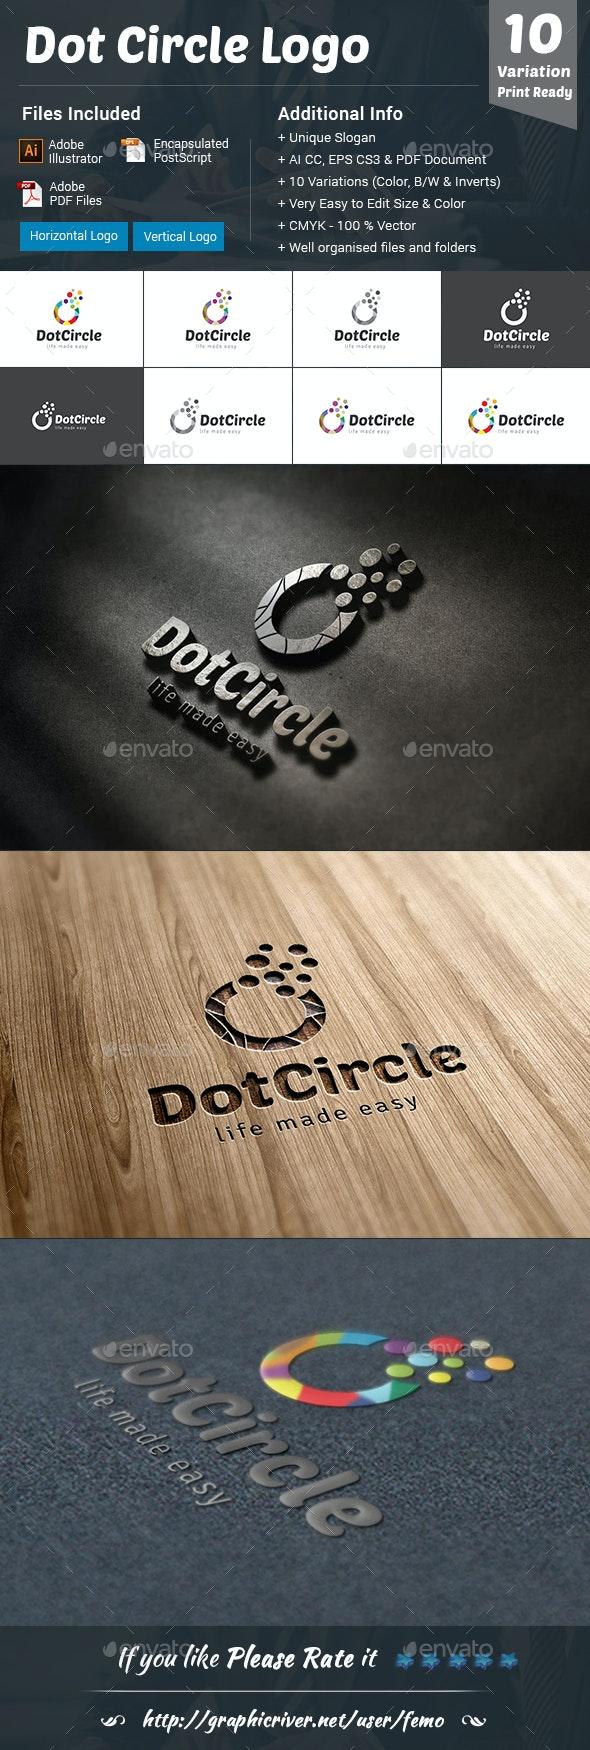 Dot Circle Logo - Vector Abstract